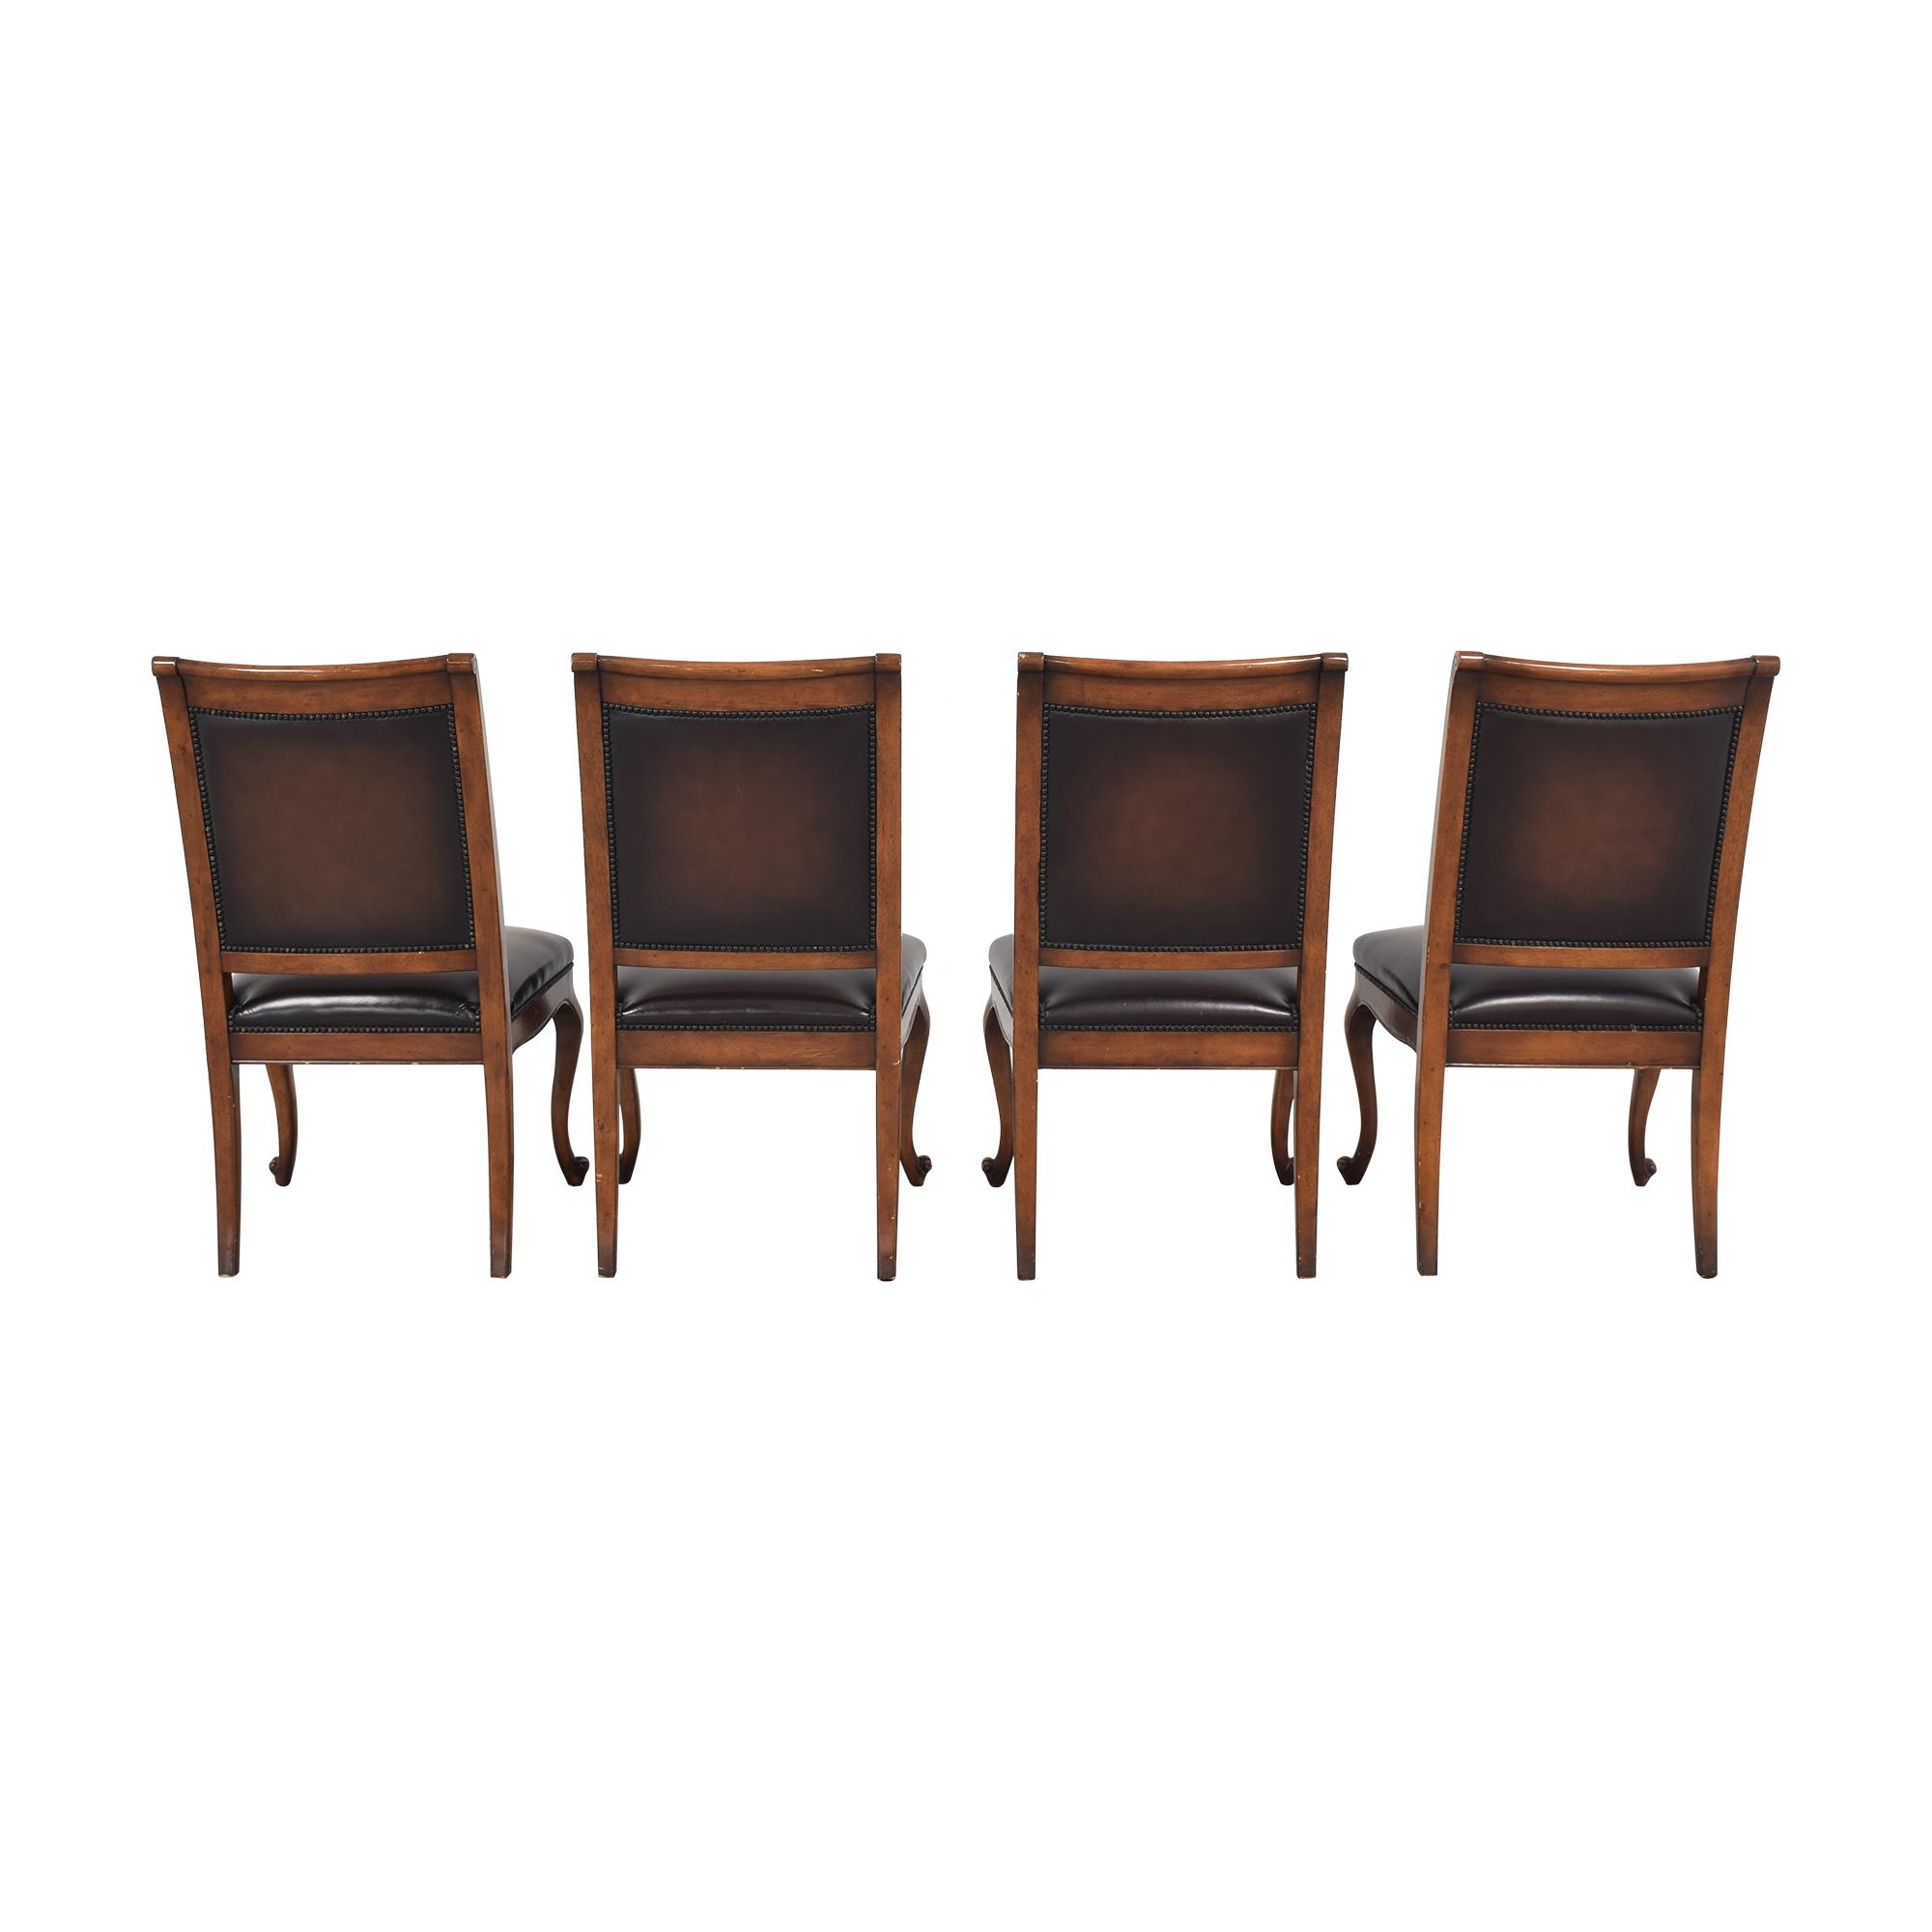 Theodore Alexander Theodore Alexander Dining Chairs price